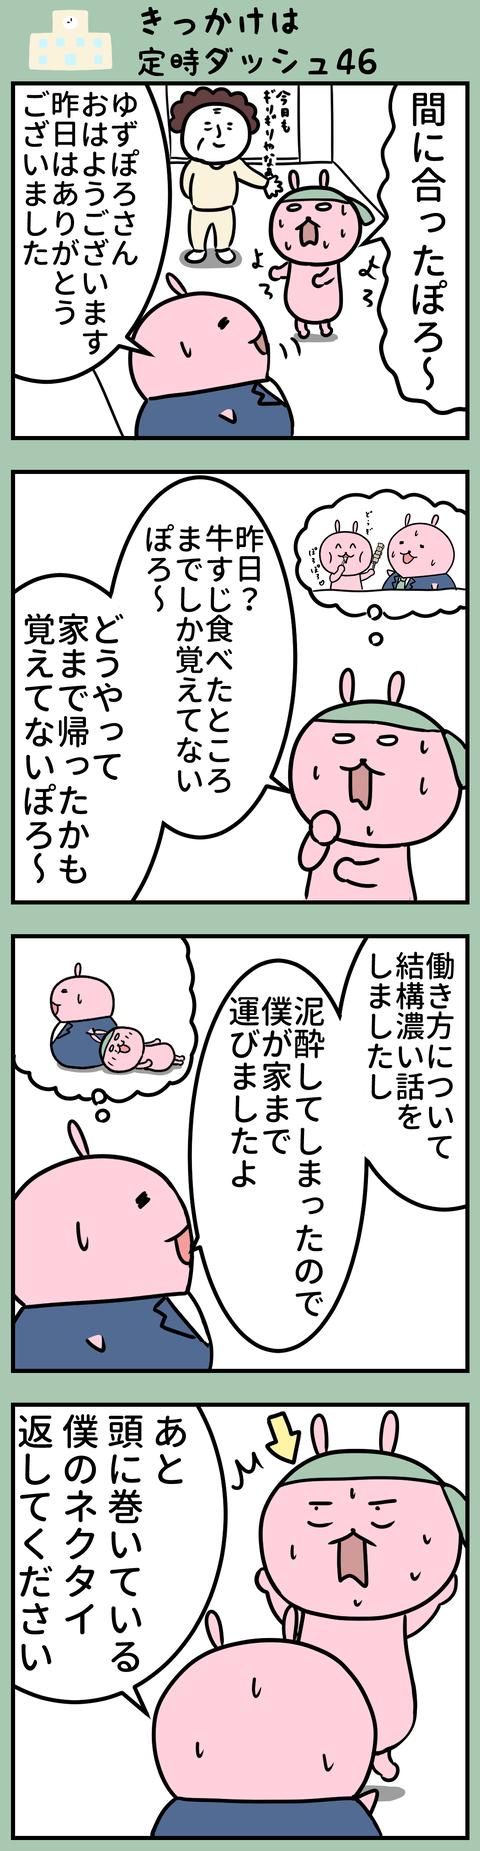 manga-yuzuporo118-1